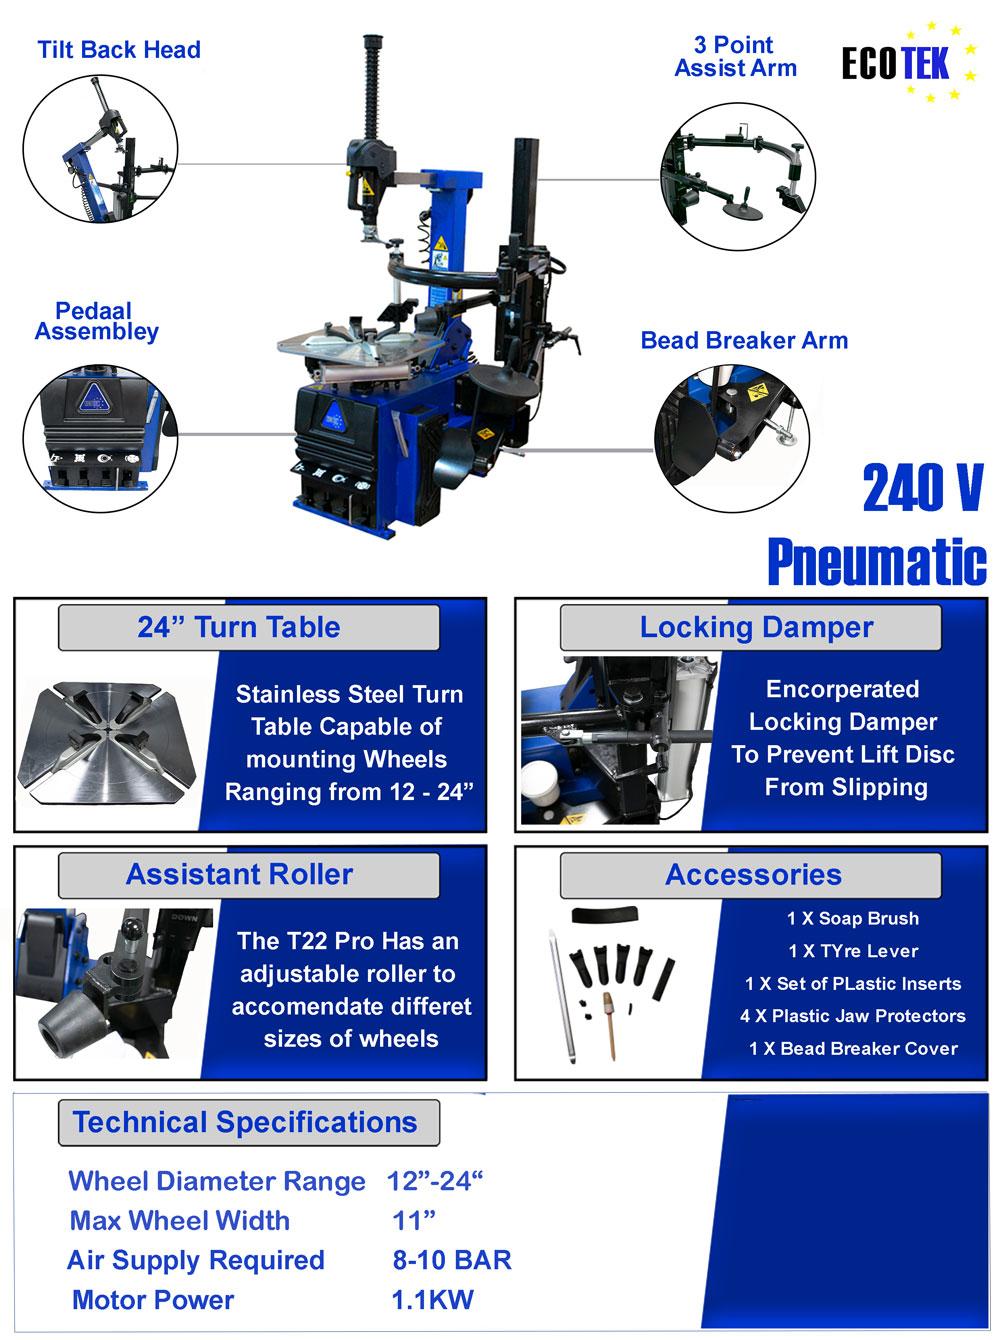 Information flyer for Ecotek T22 tyre changer